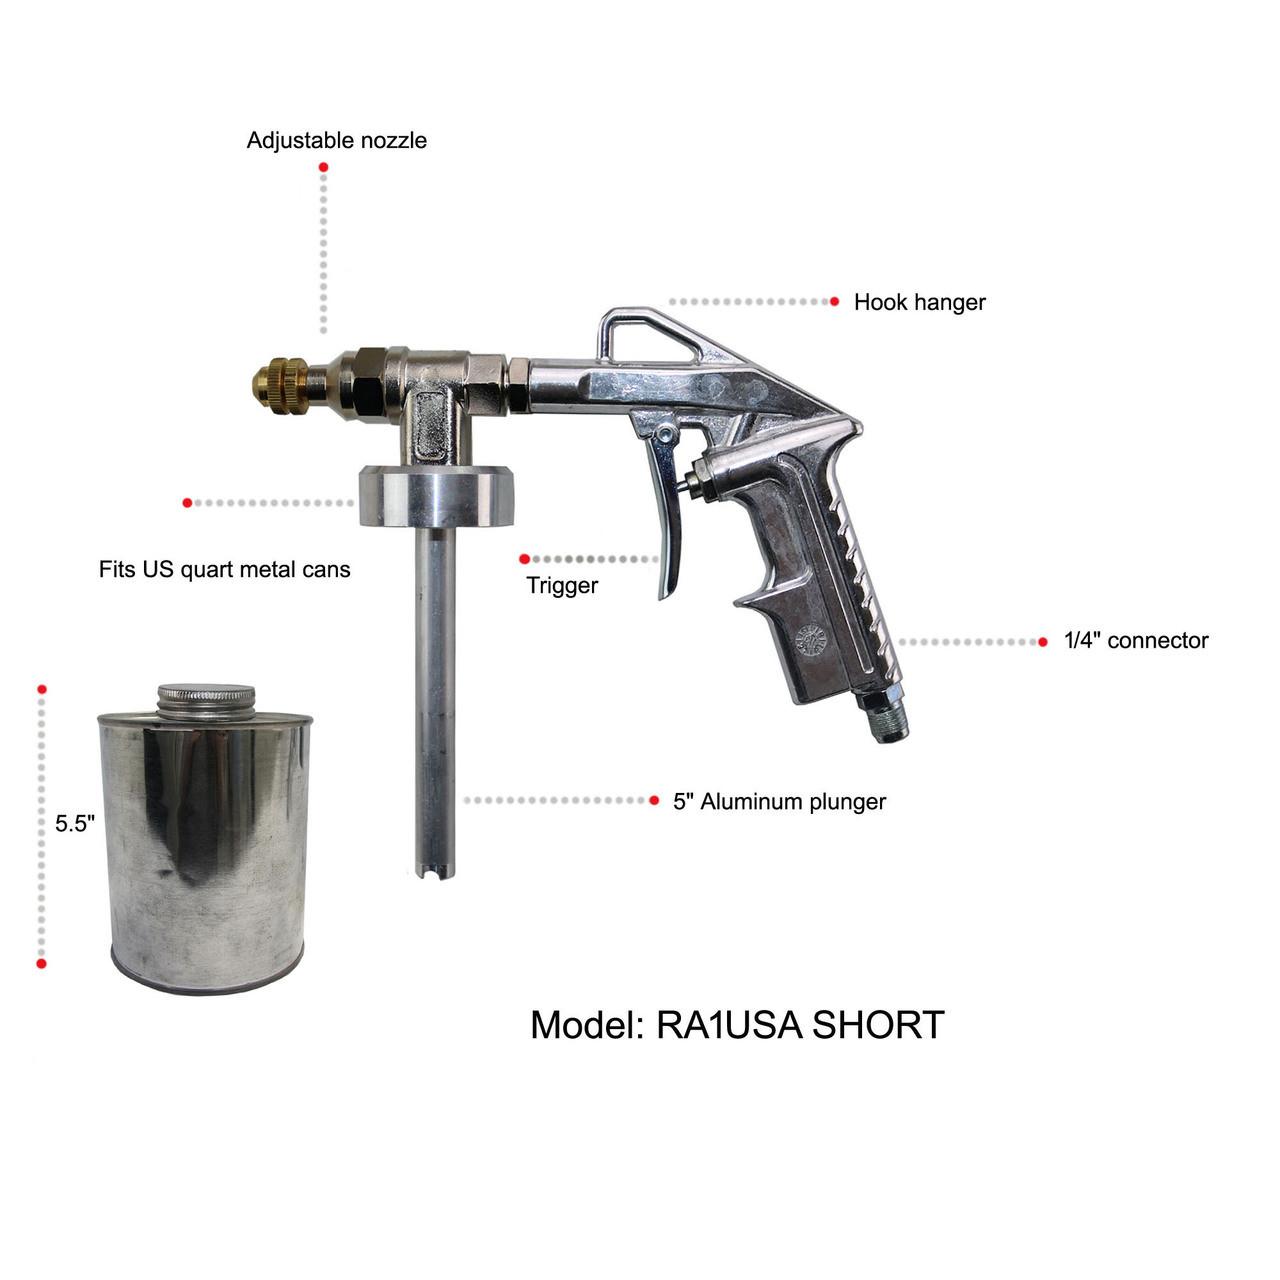 Undercoating Economy Spray Gun RA/1USASHORT